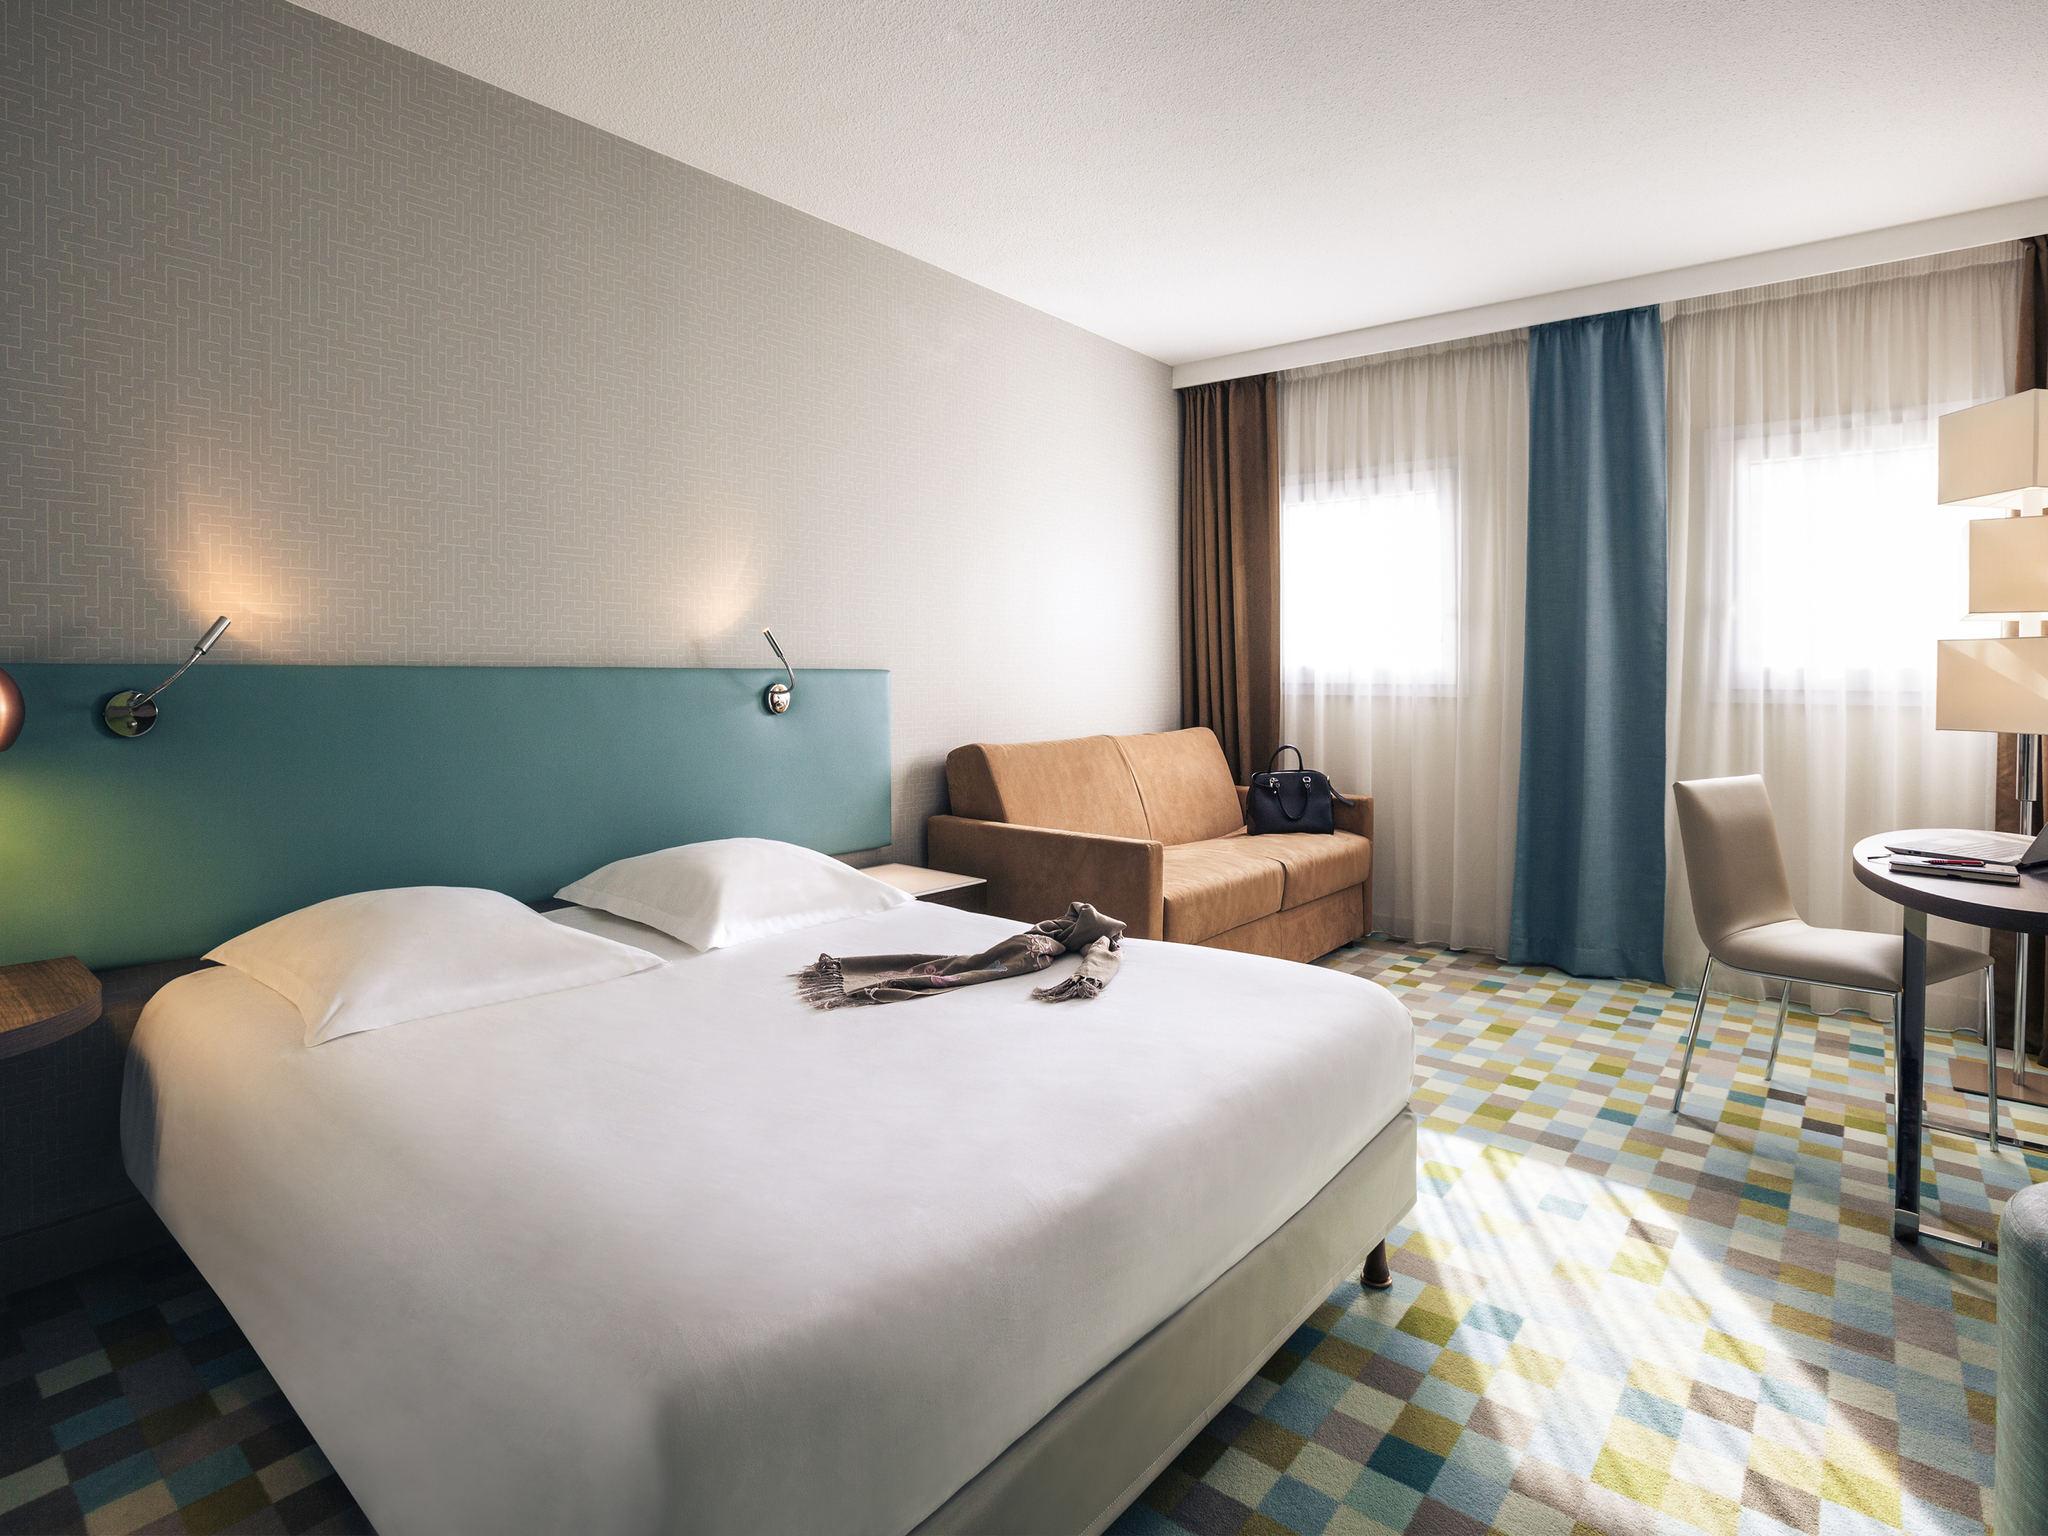 Hotel - Hôtel Mercure Marne la vallée Bussy St Georges